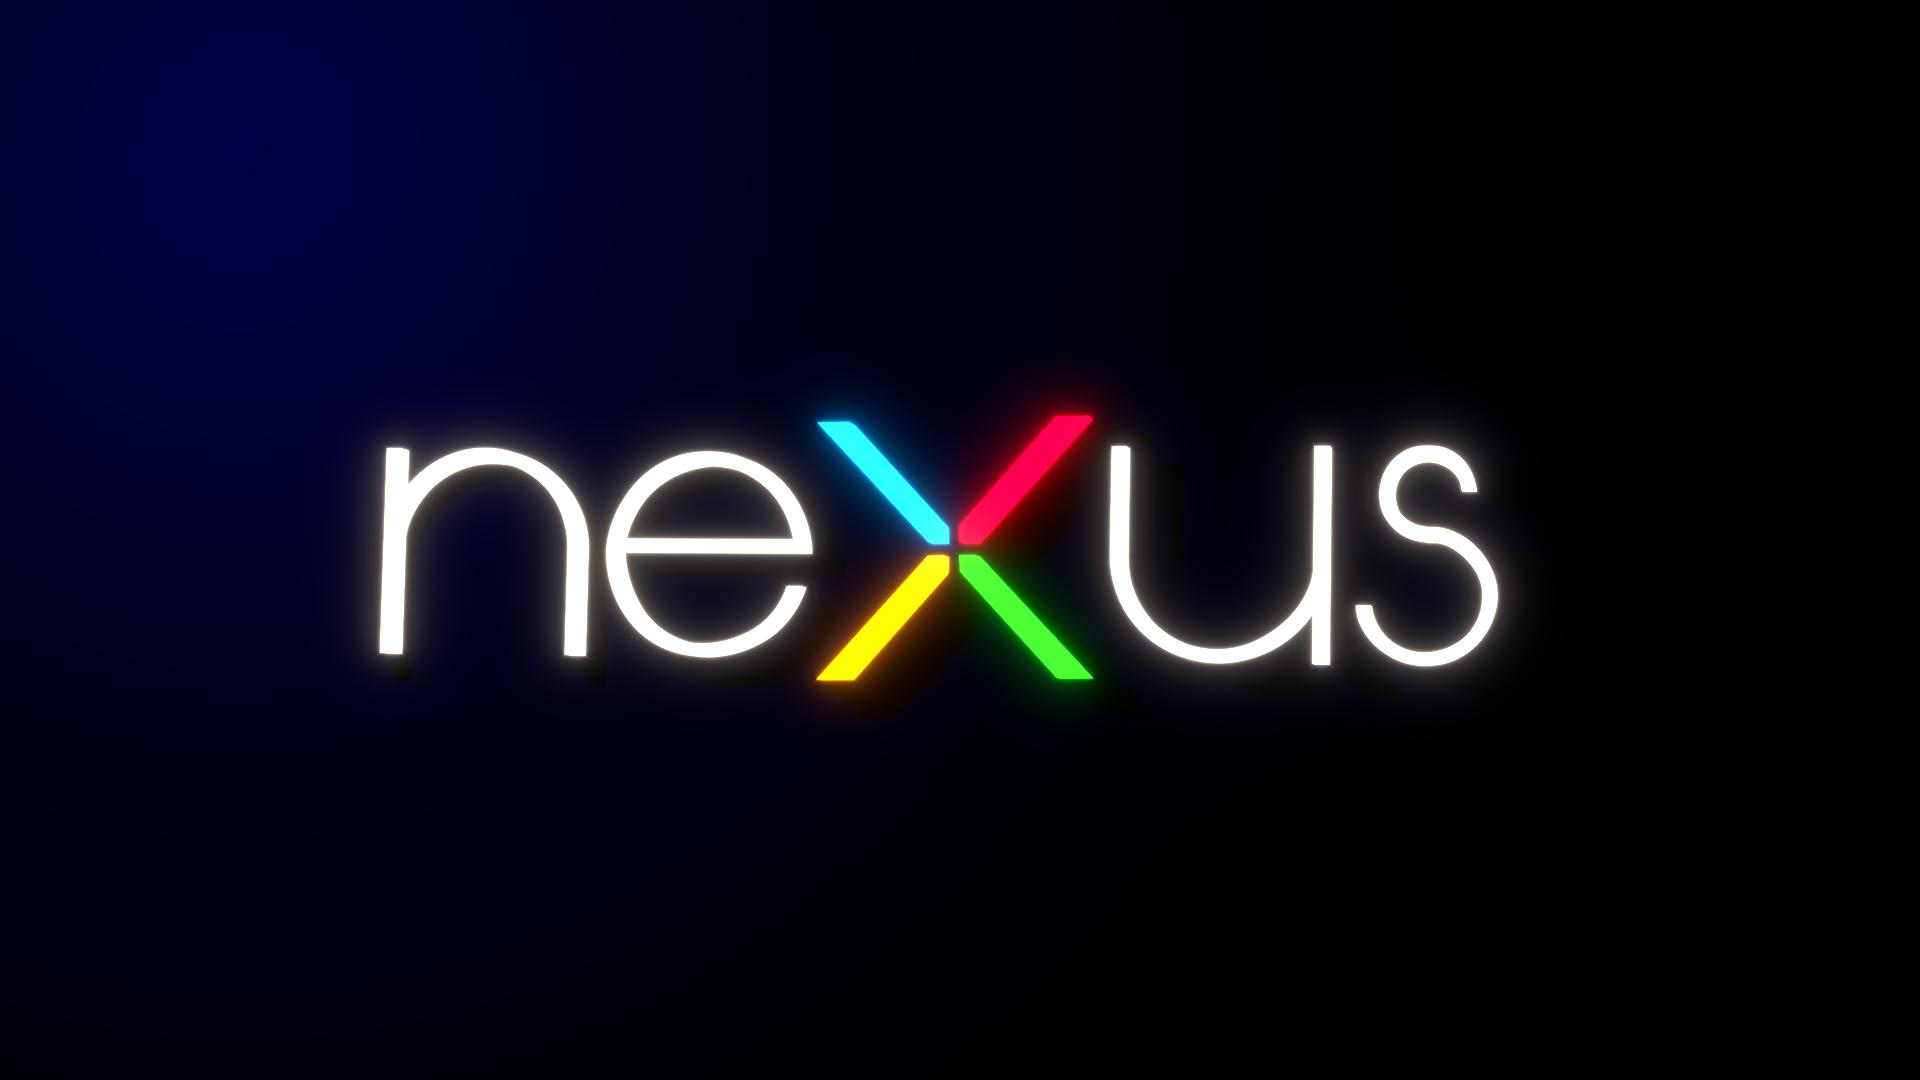 http://actu.meilleurmobile.com/wp-content/uploads/2014/05/google-nexus.png